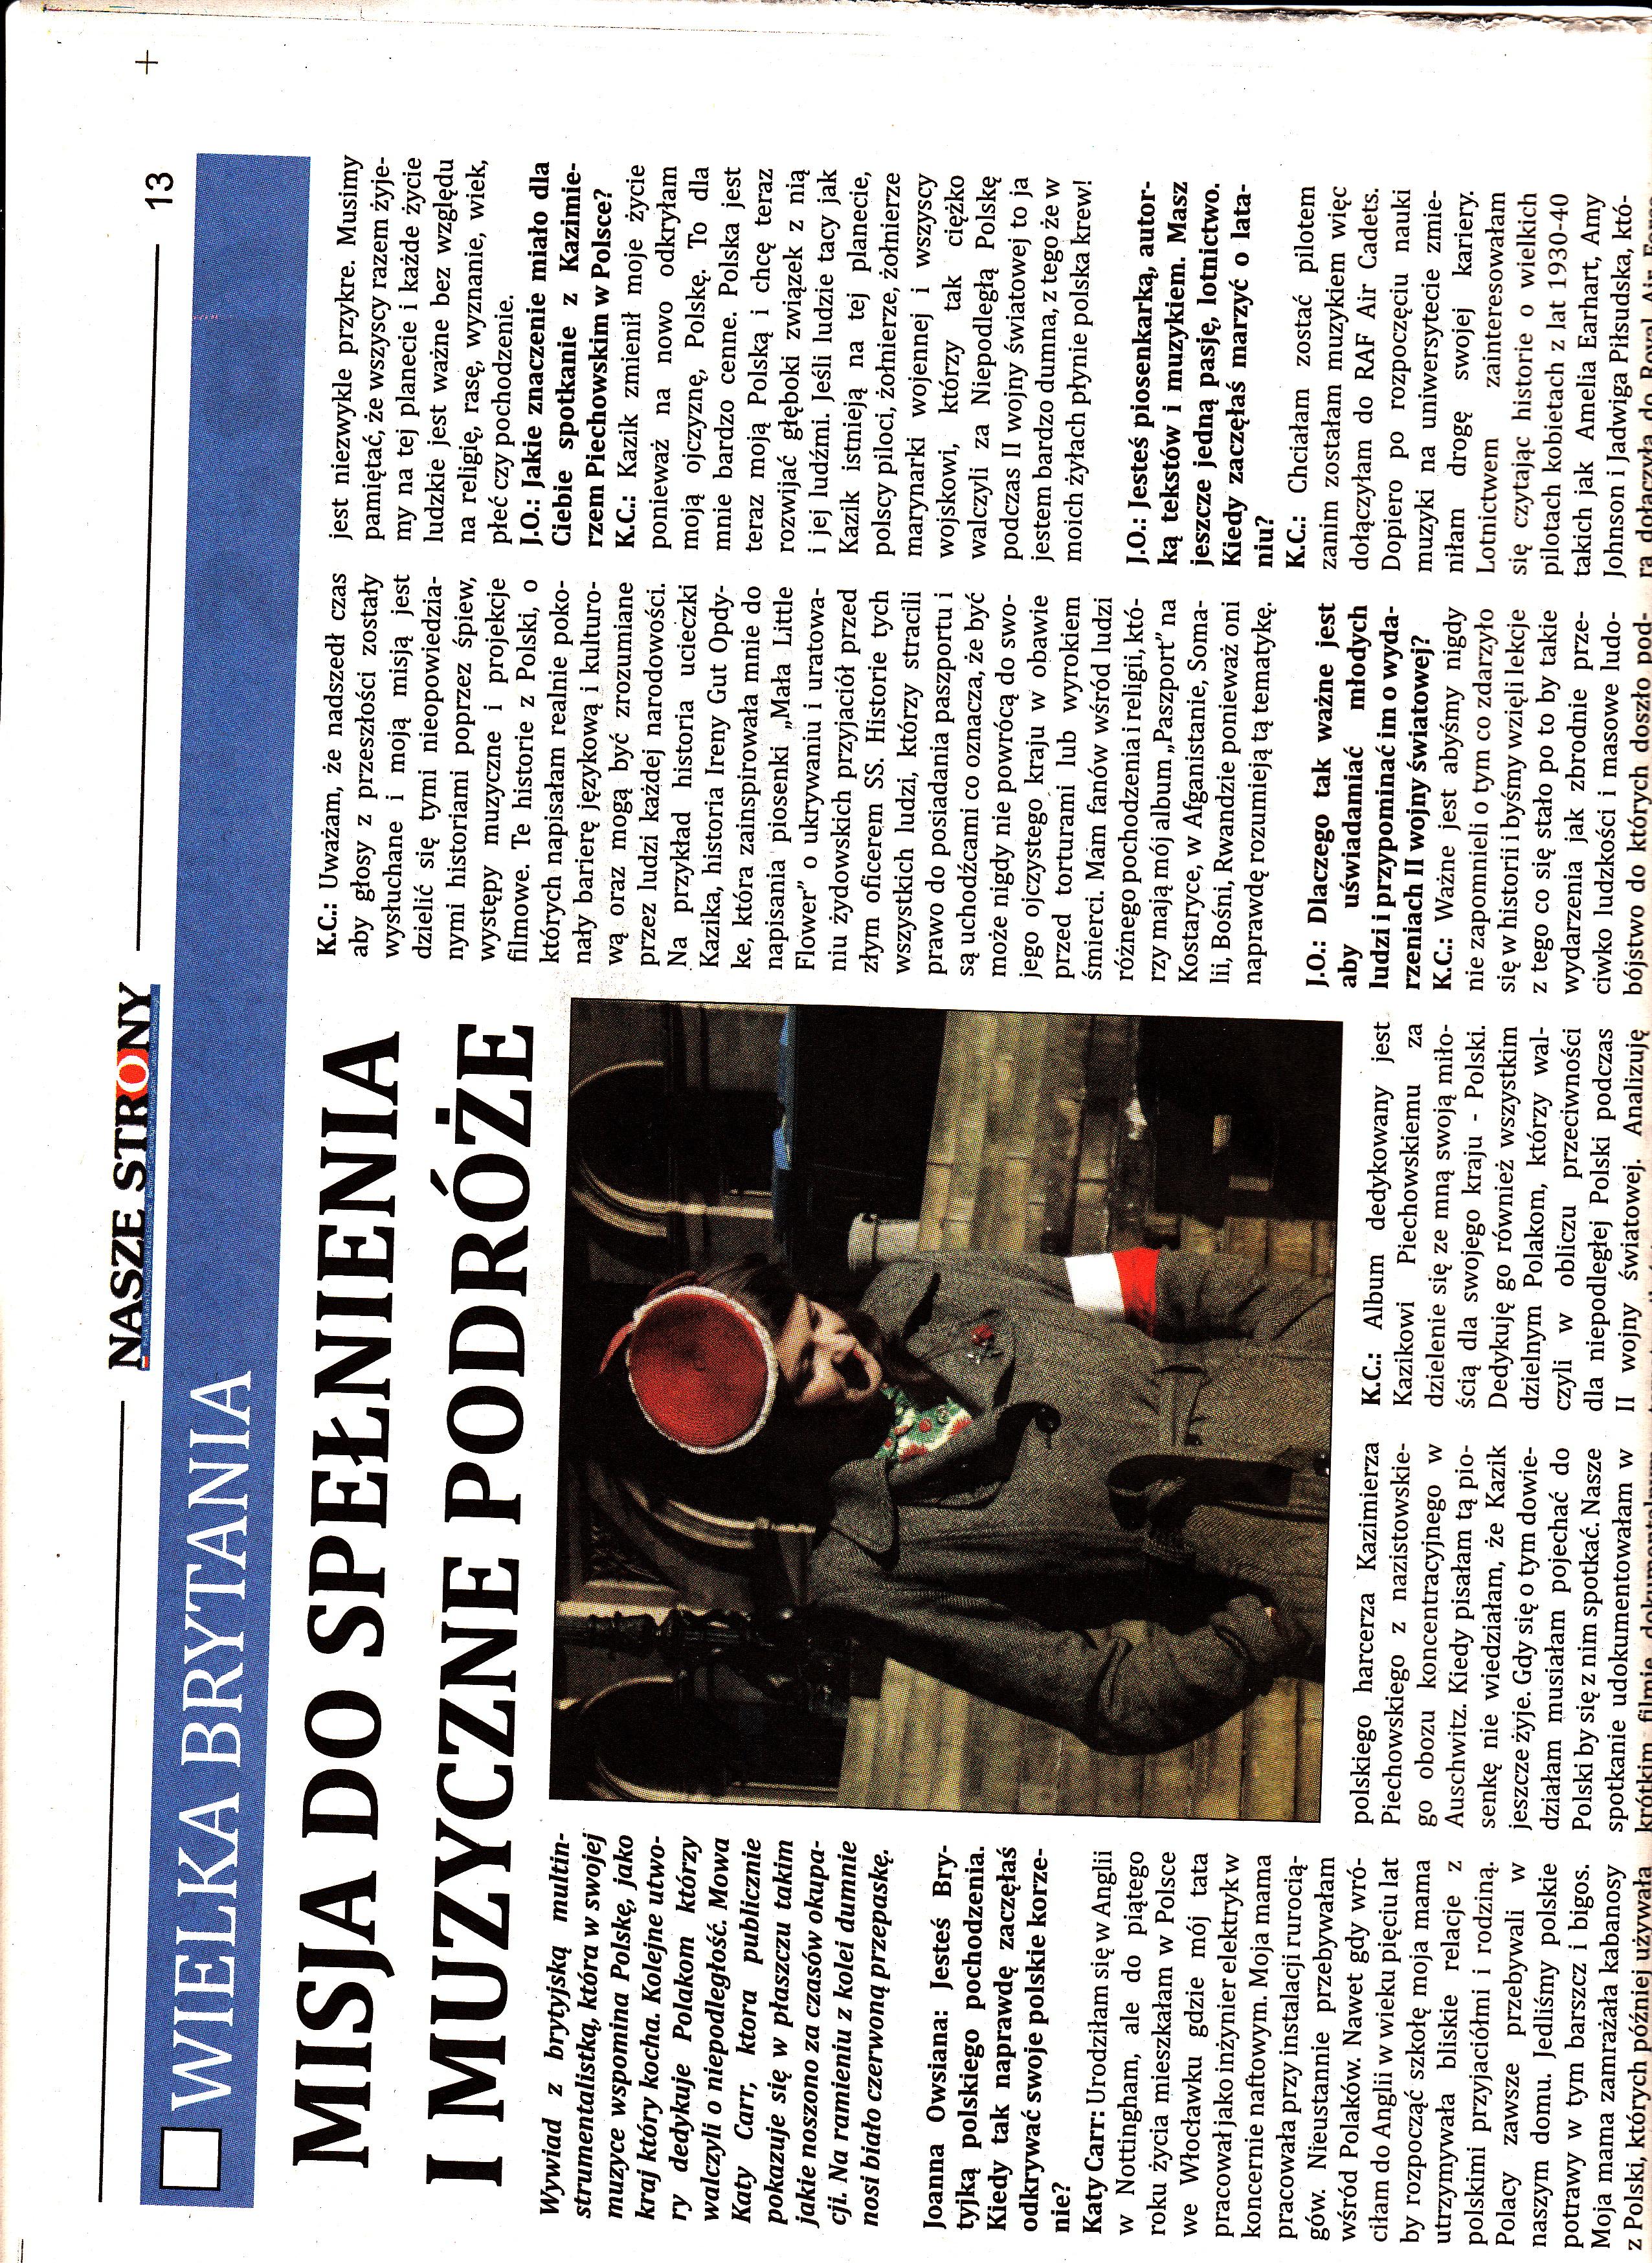 Nasze Strony - Polish Paper i